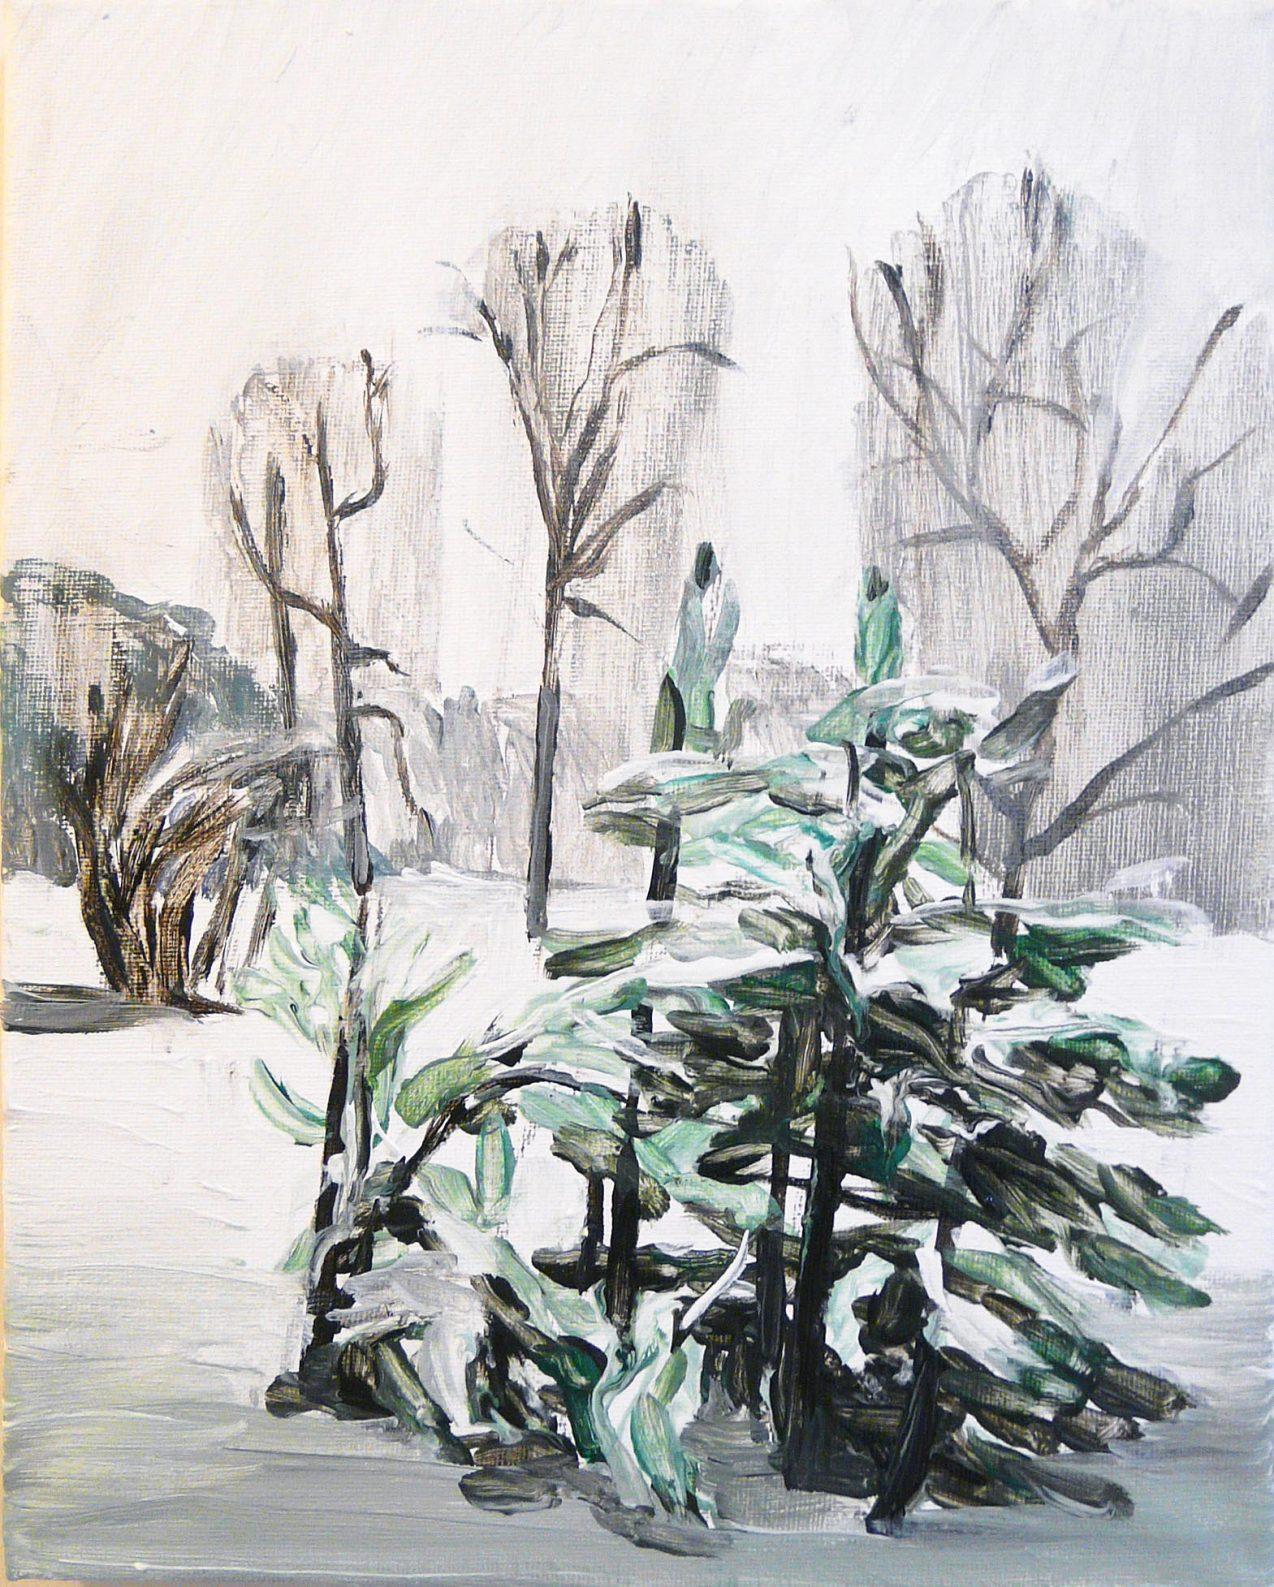 Outskirts Winter 5-5 201530cm x 24cm Acrylic canvas